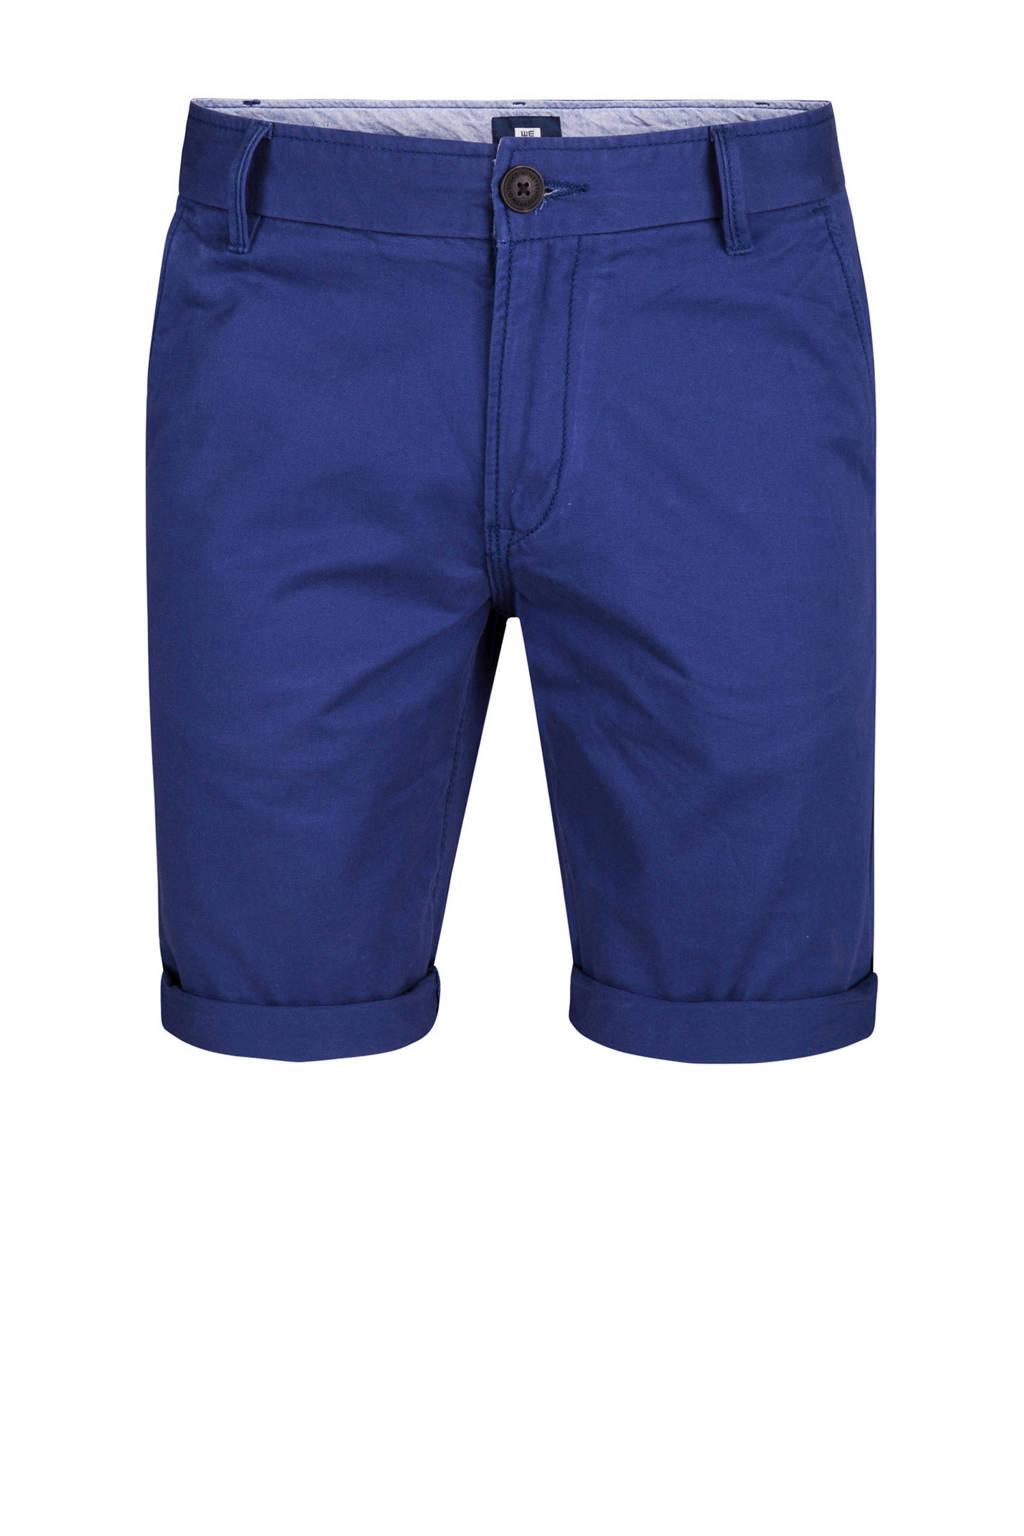 WE Fashion regular fit bermuda, Blauw